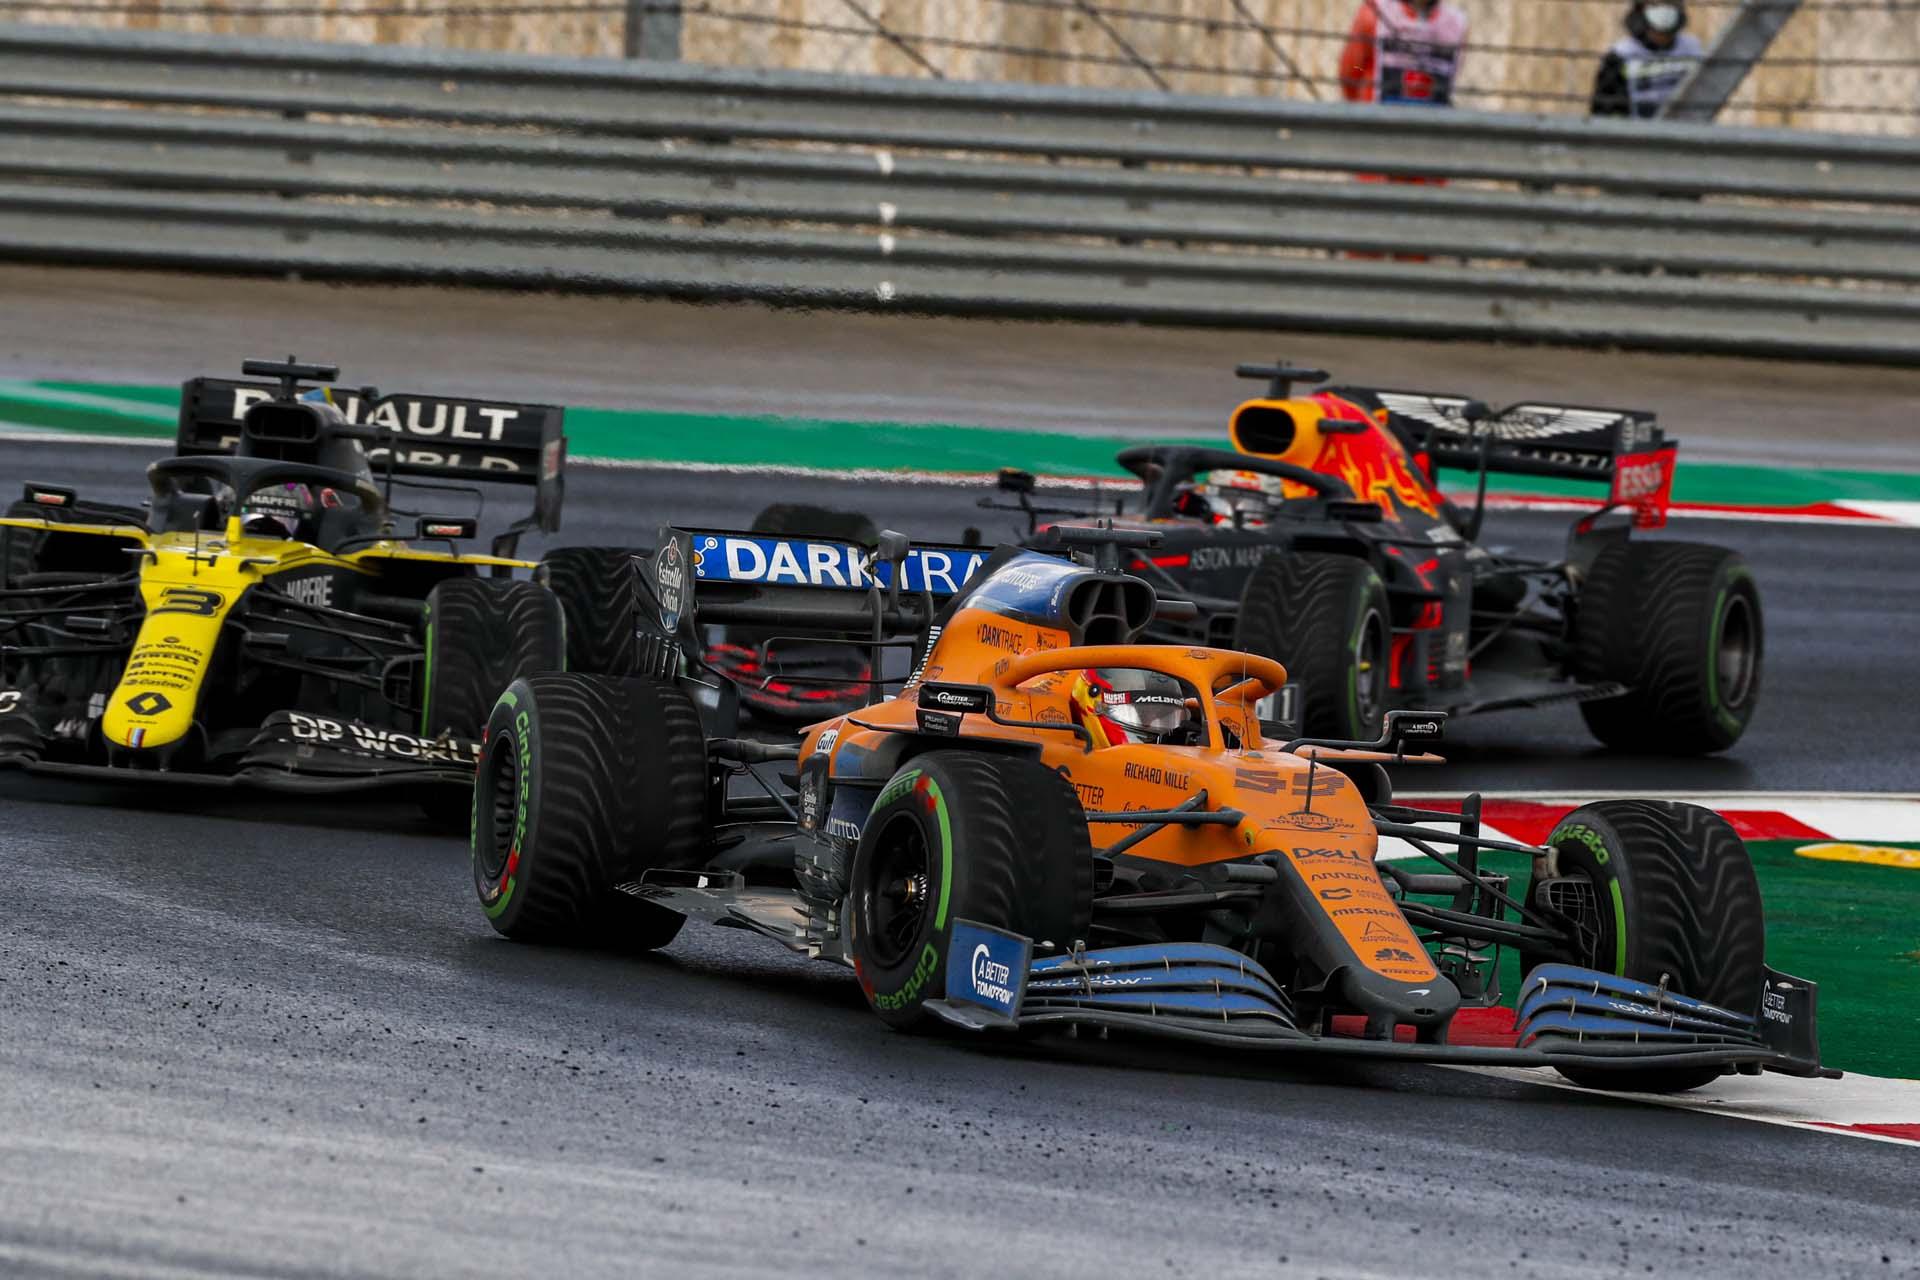 2020TurkishGPSunday_McLaren_2020TurkishGrandPrixSunday_GP2014_121105_2ST6681